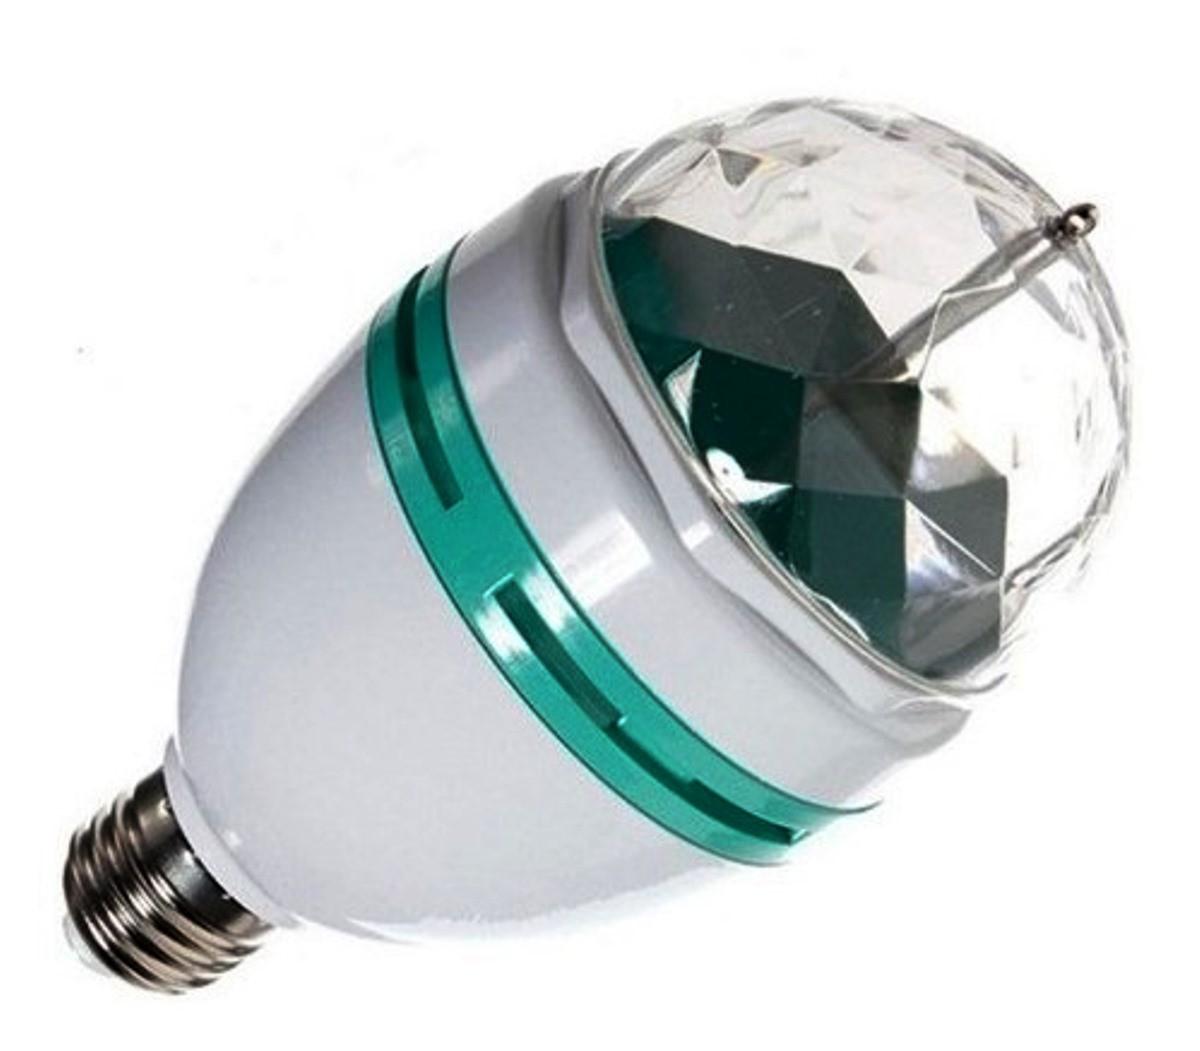 Kit 8 Mini Bola Maluca Led Lampada Colorida Rgb Dj Festas